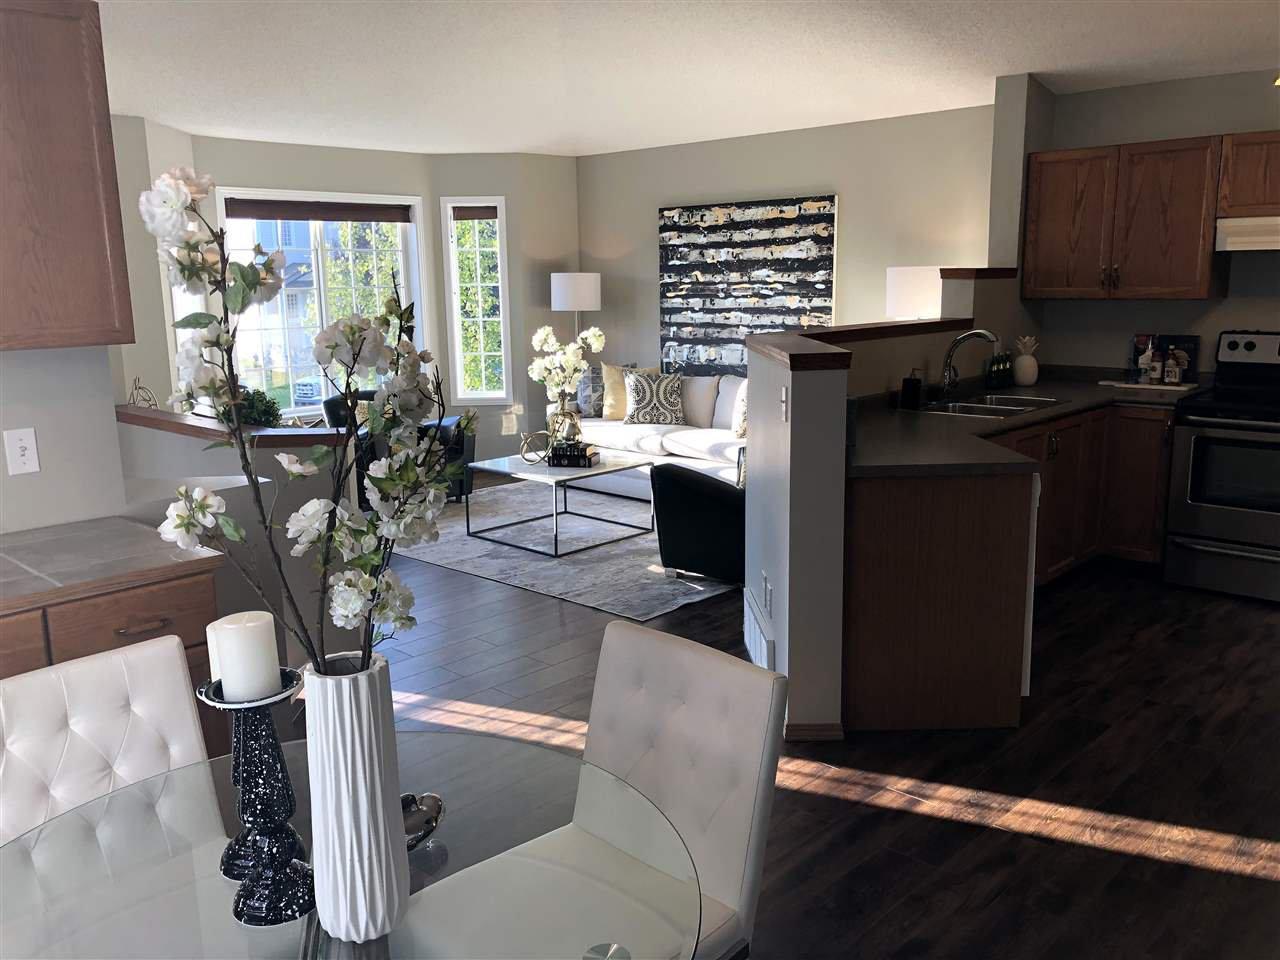 Main Photo: 15039 133 ST in Edmonton: Zone 27 House for sale : MLS®# E4176058